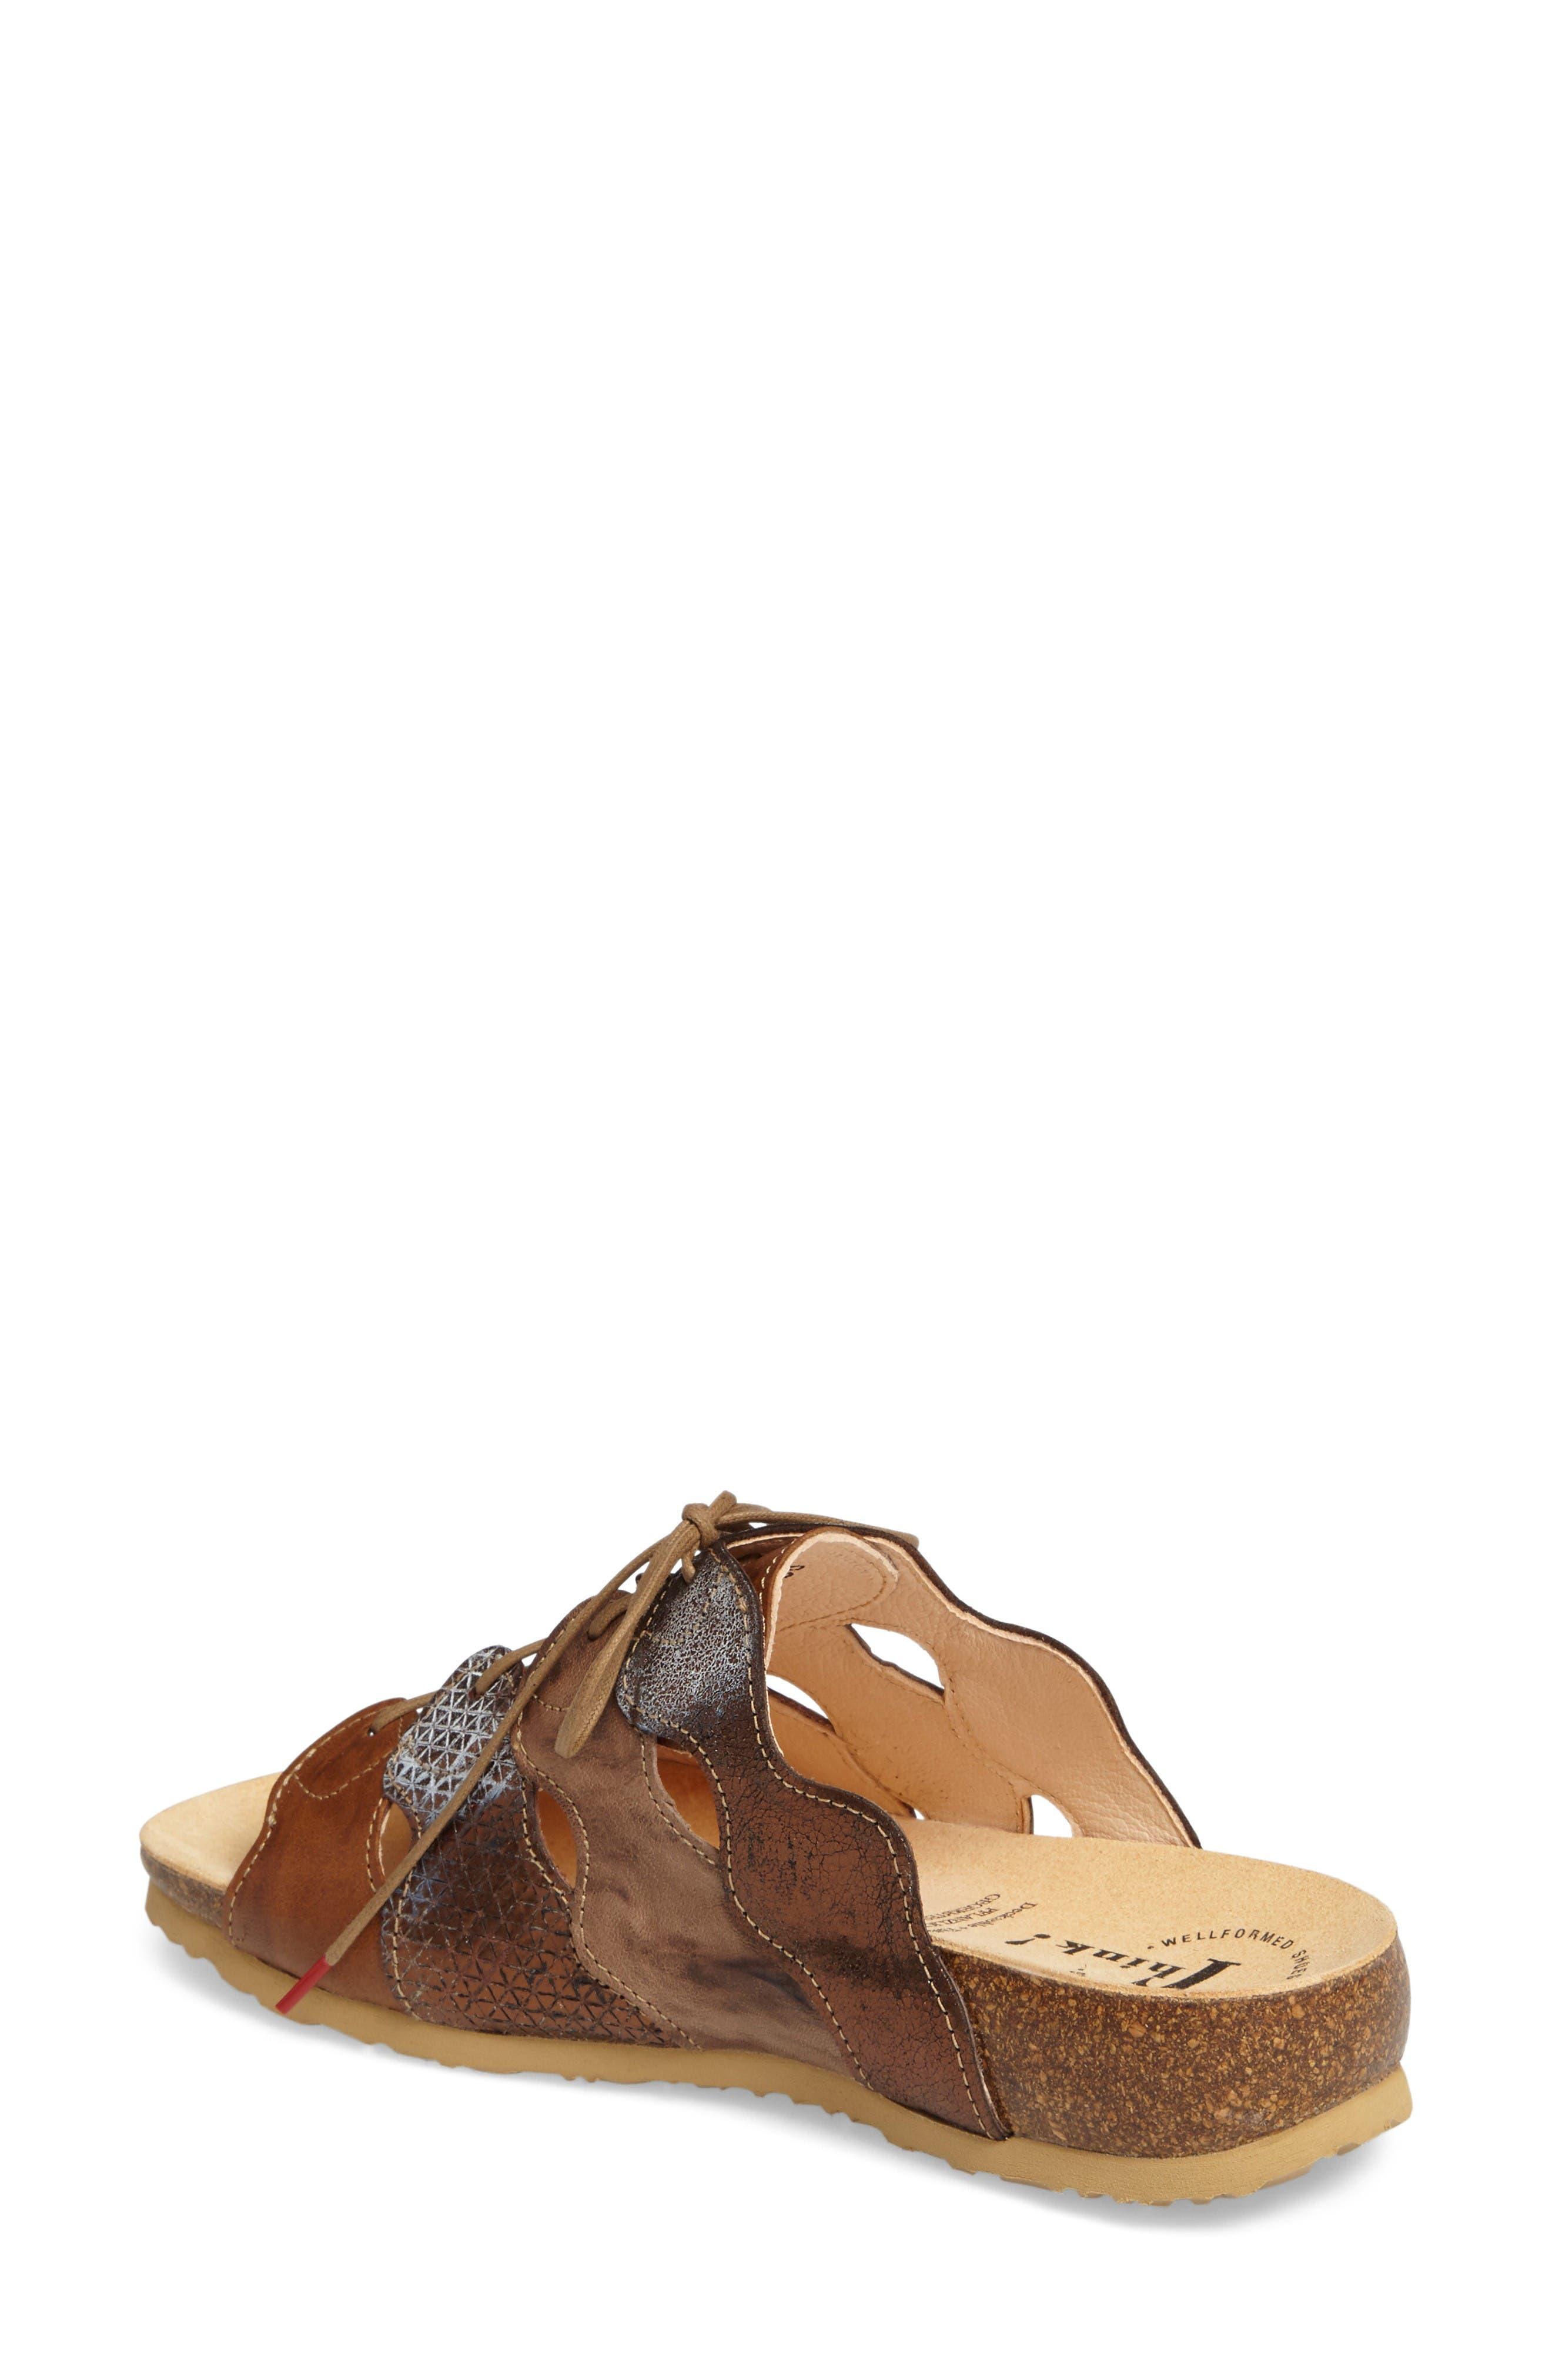 Julia Sandal,                             Alternate thumbnail 2, color,                             Lion Brown Leather